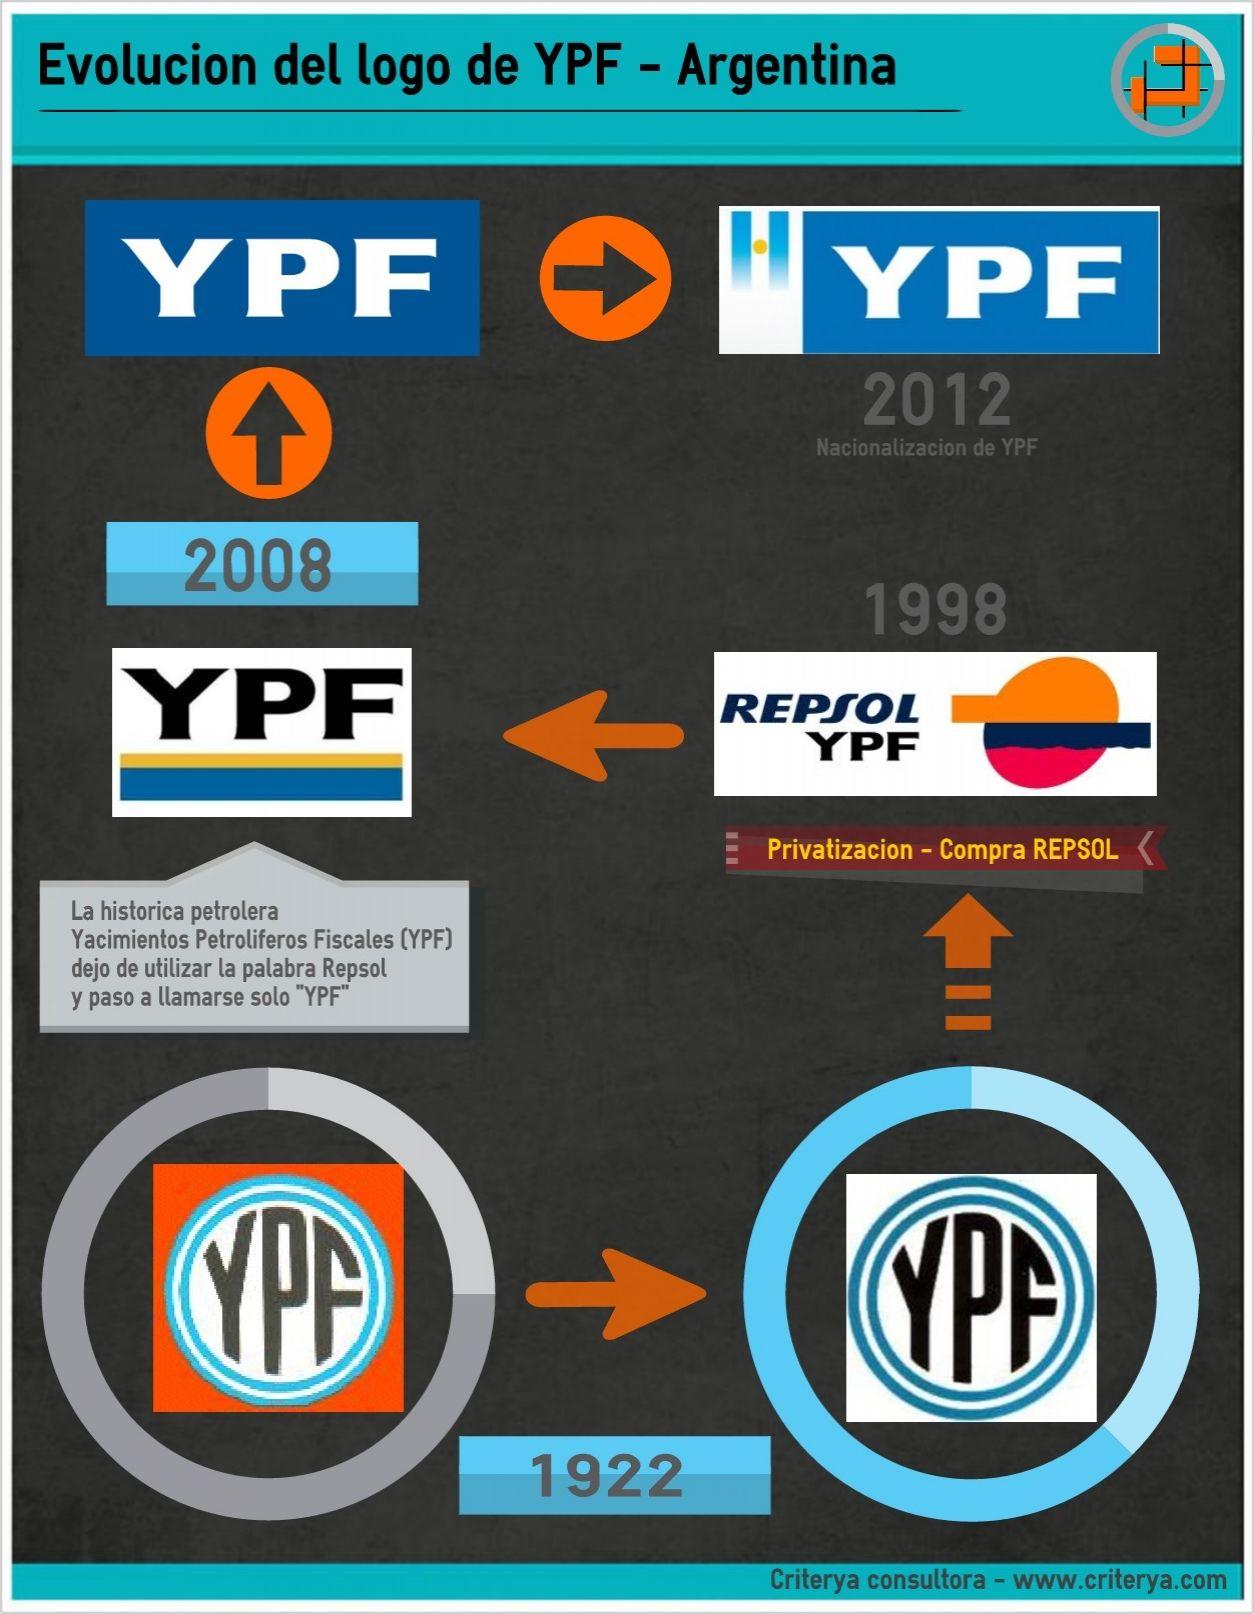 Evolucion historica del logo de YPF Evolucion, Palabras